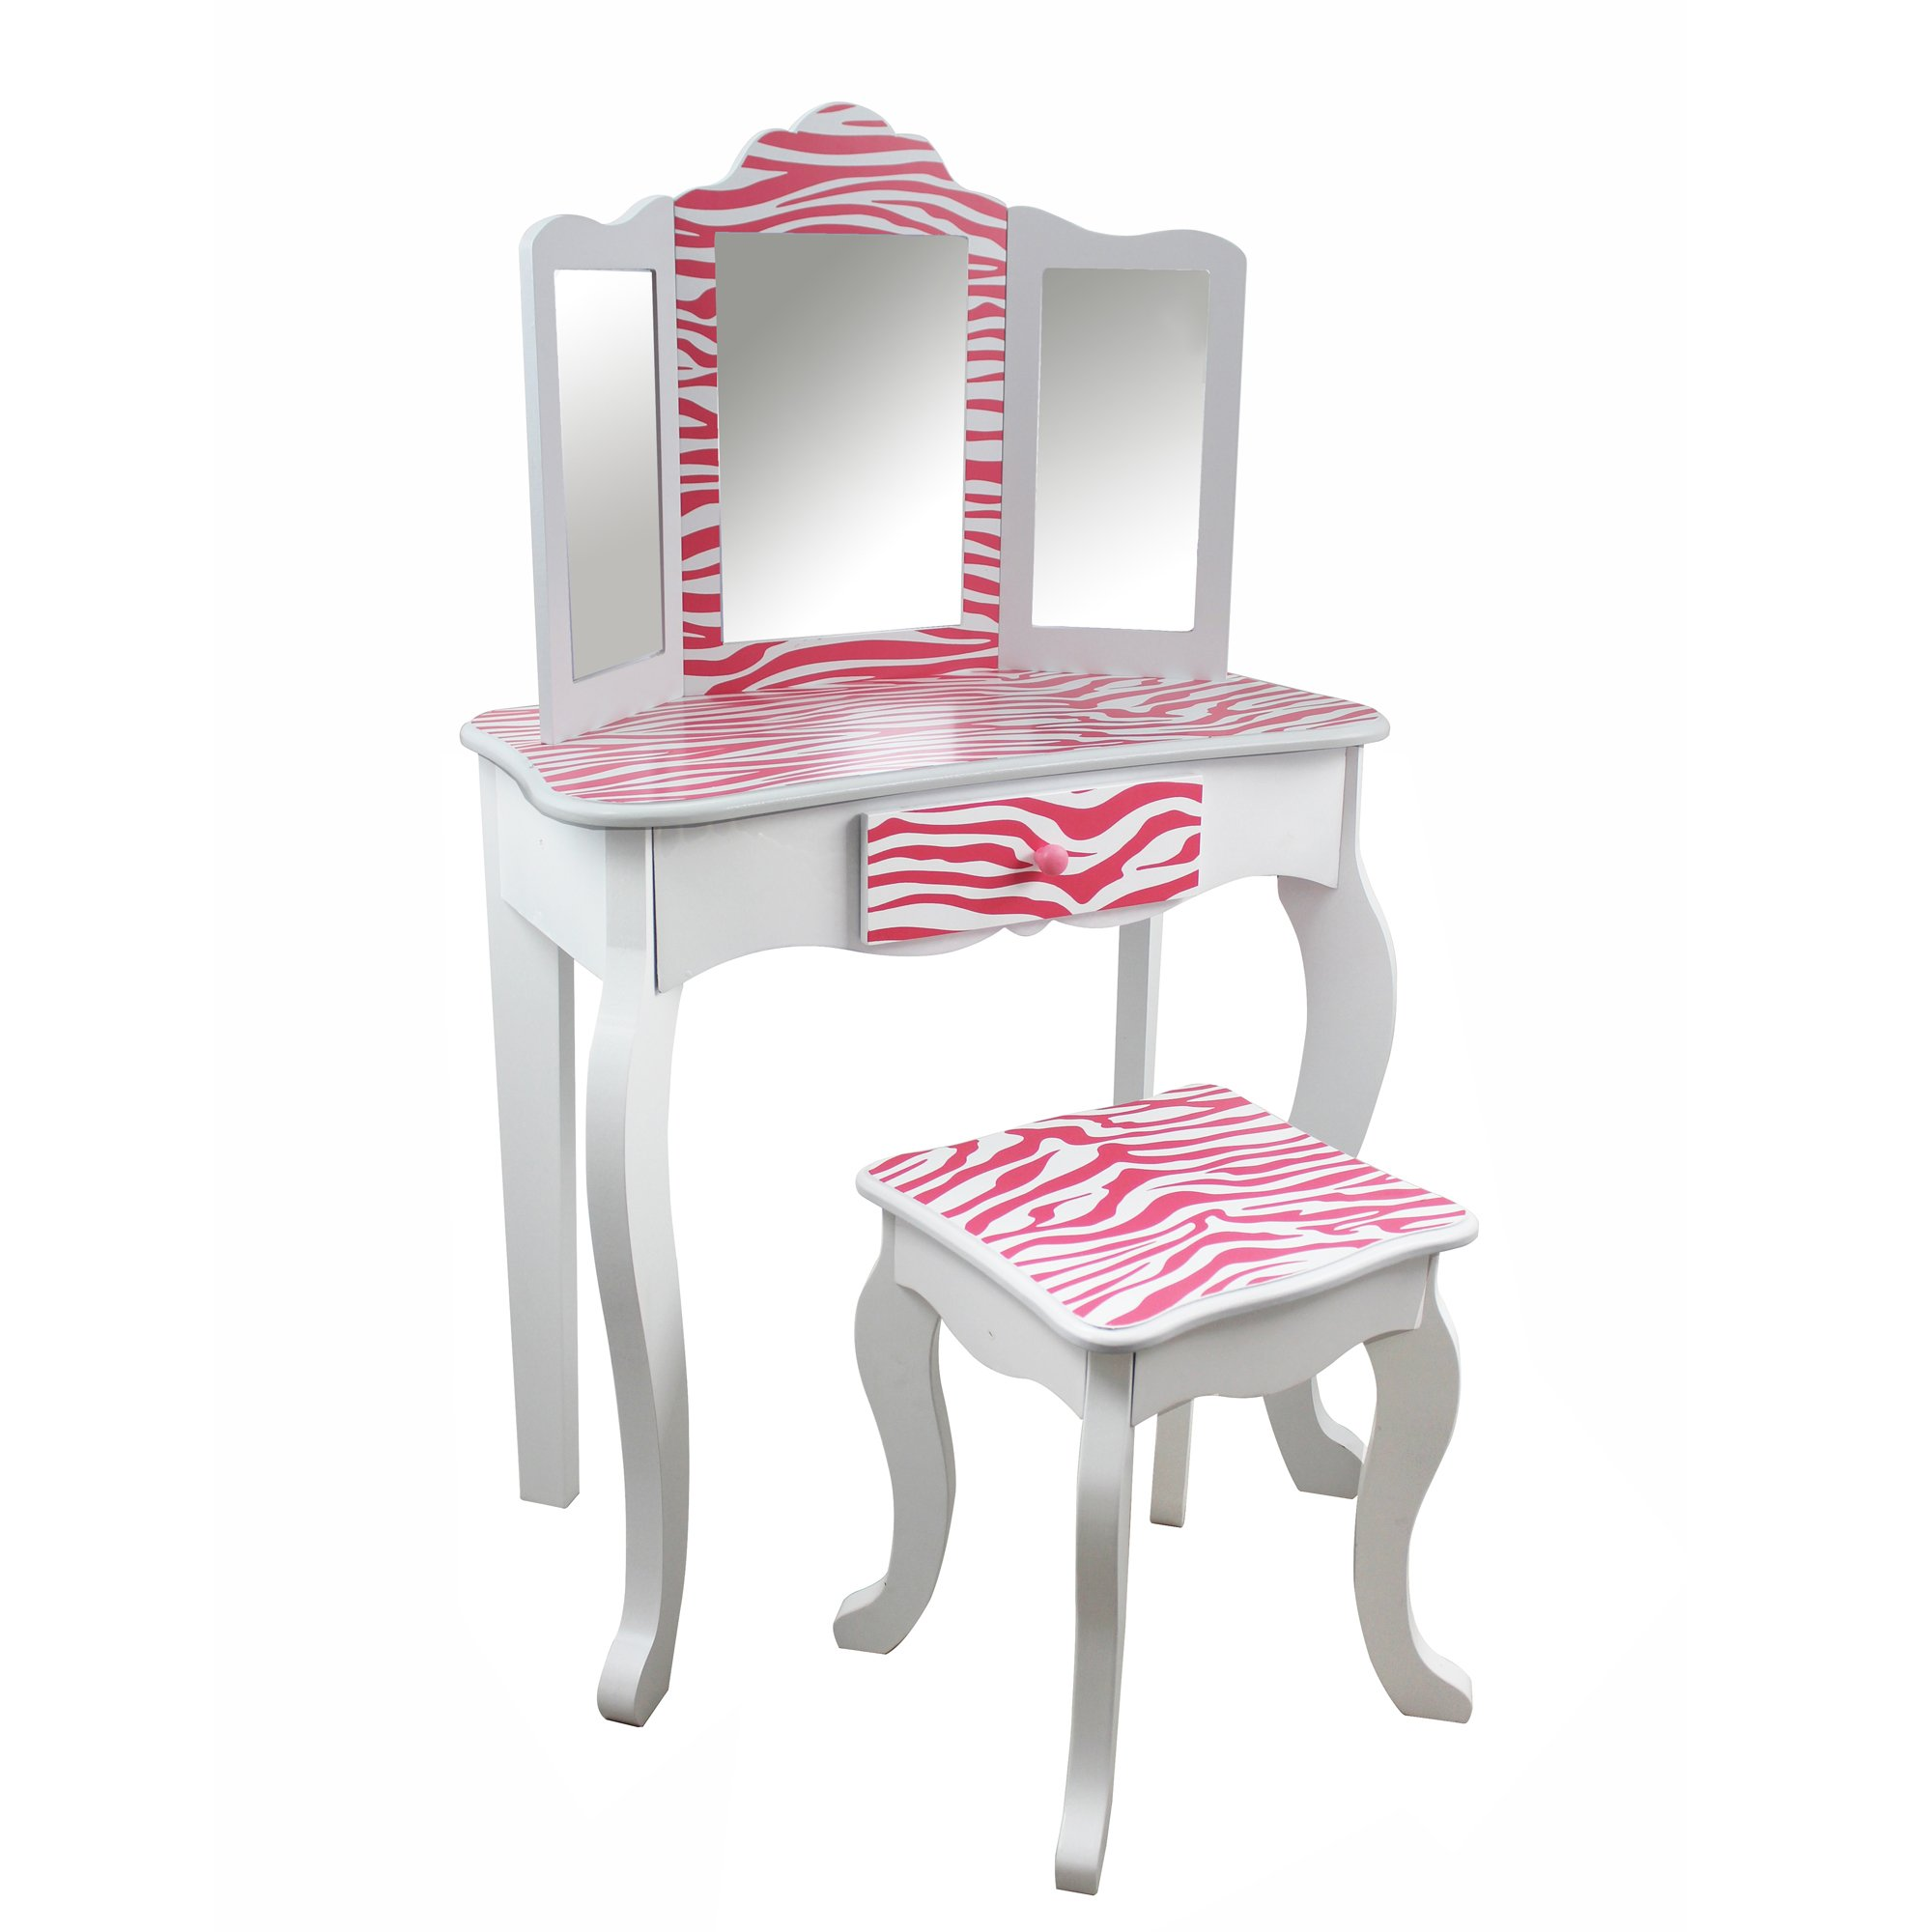 Teamson Kids Fashion Prints Girls Vanity Table And Stool Set With